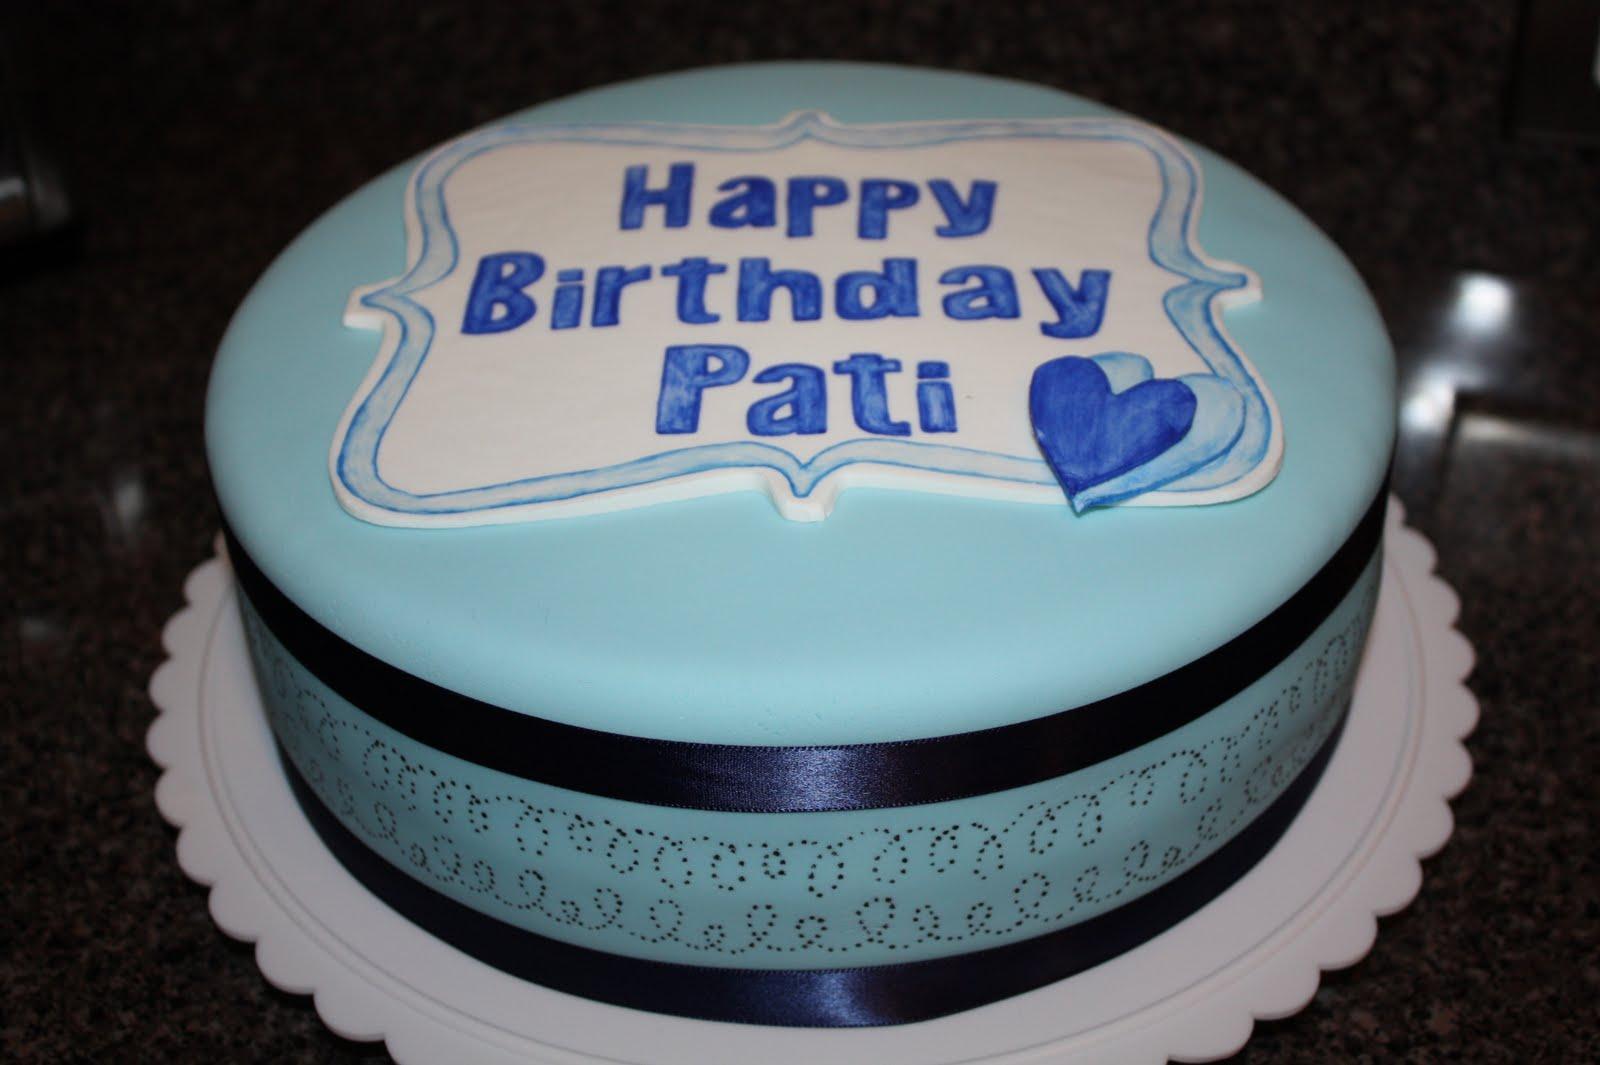 Birthday Cakes Ideas For My Husband ~ A crafty escape fondant birthday cake